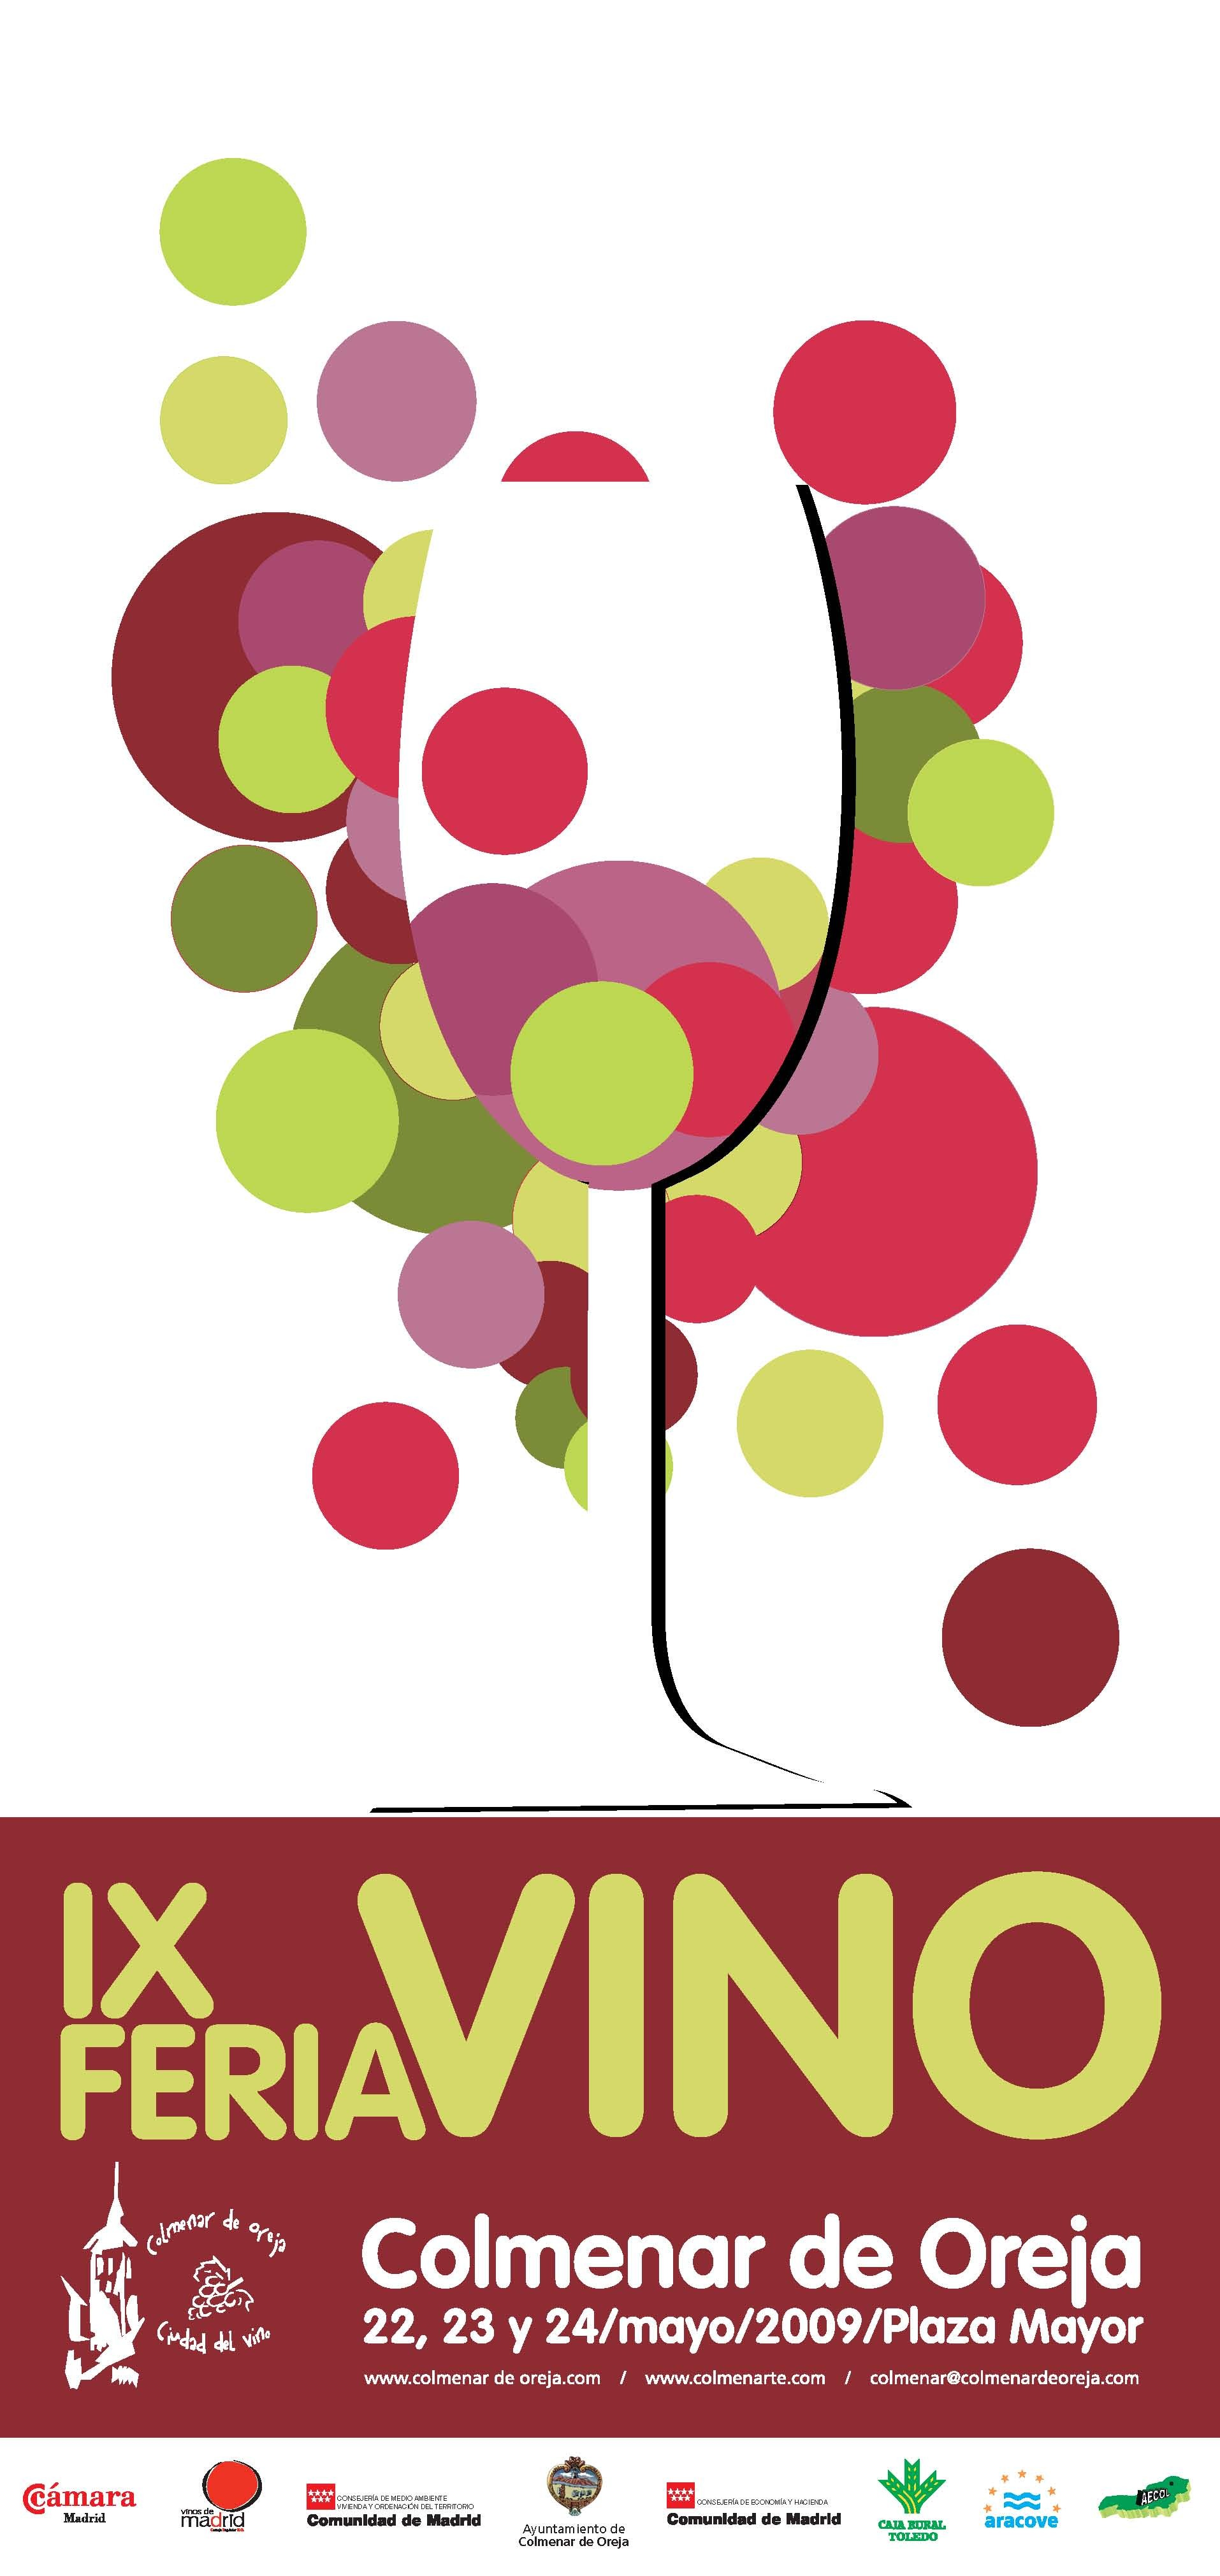 Colmenar de Oreja X Feria del Vino